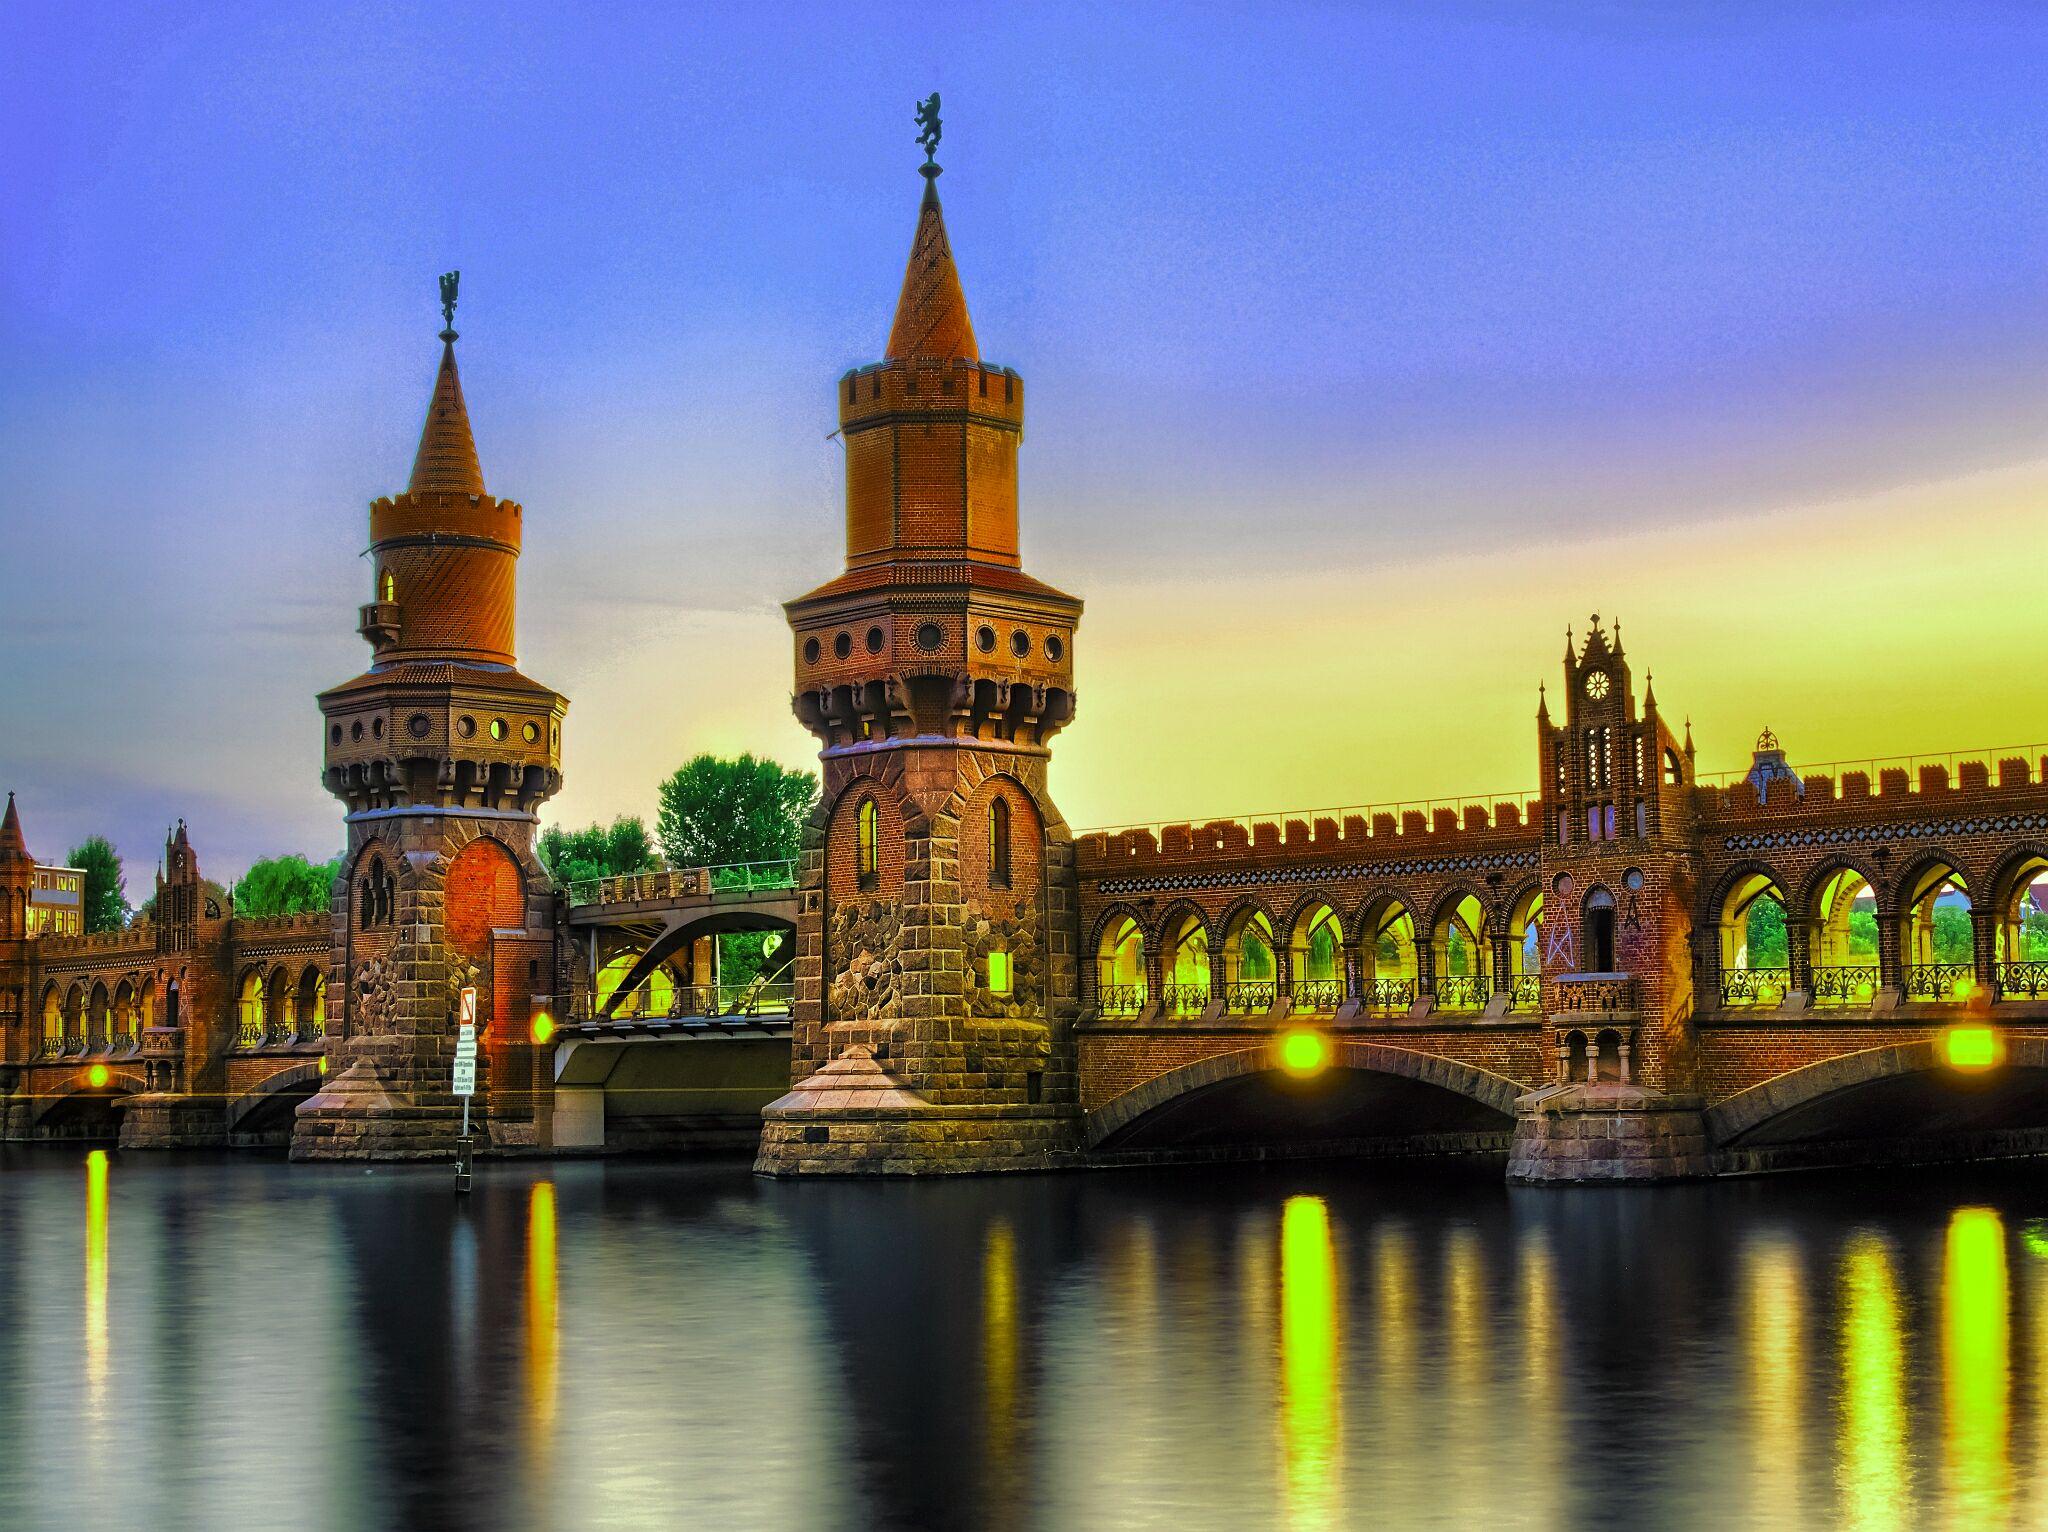 Bridge: Bridge, River, Light, Night, City, Berlin, Germany, Spree